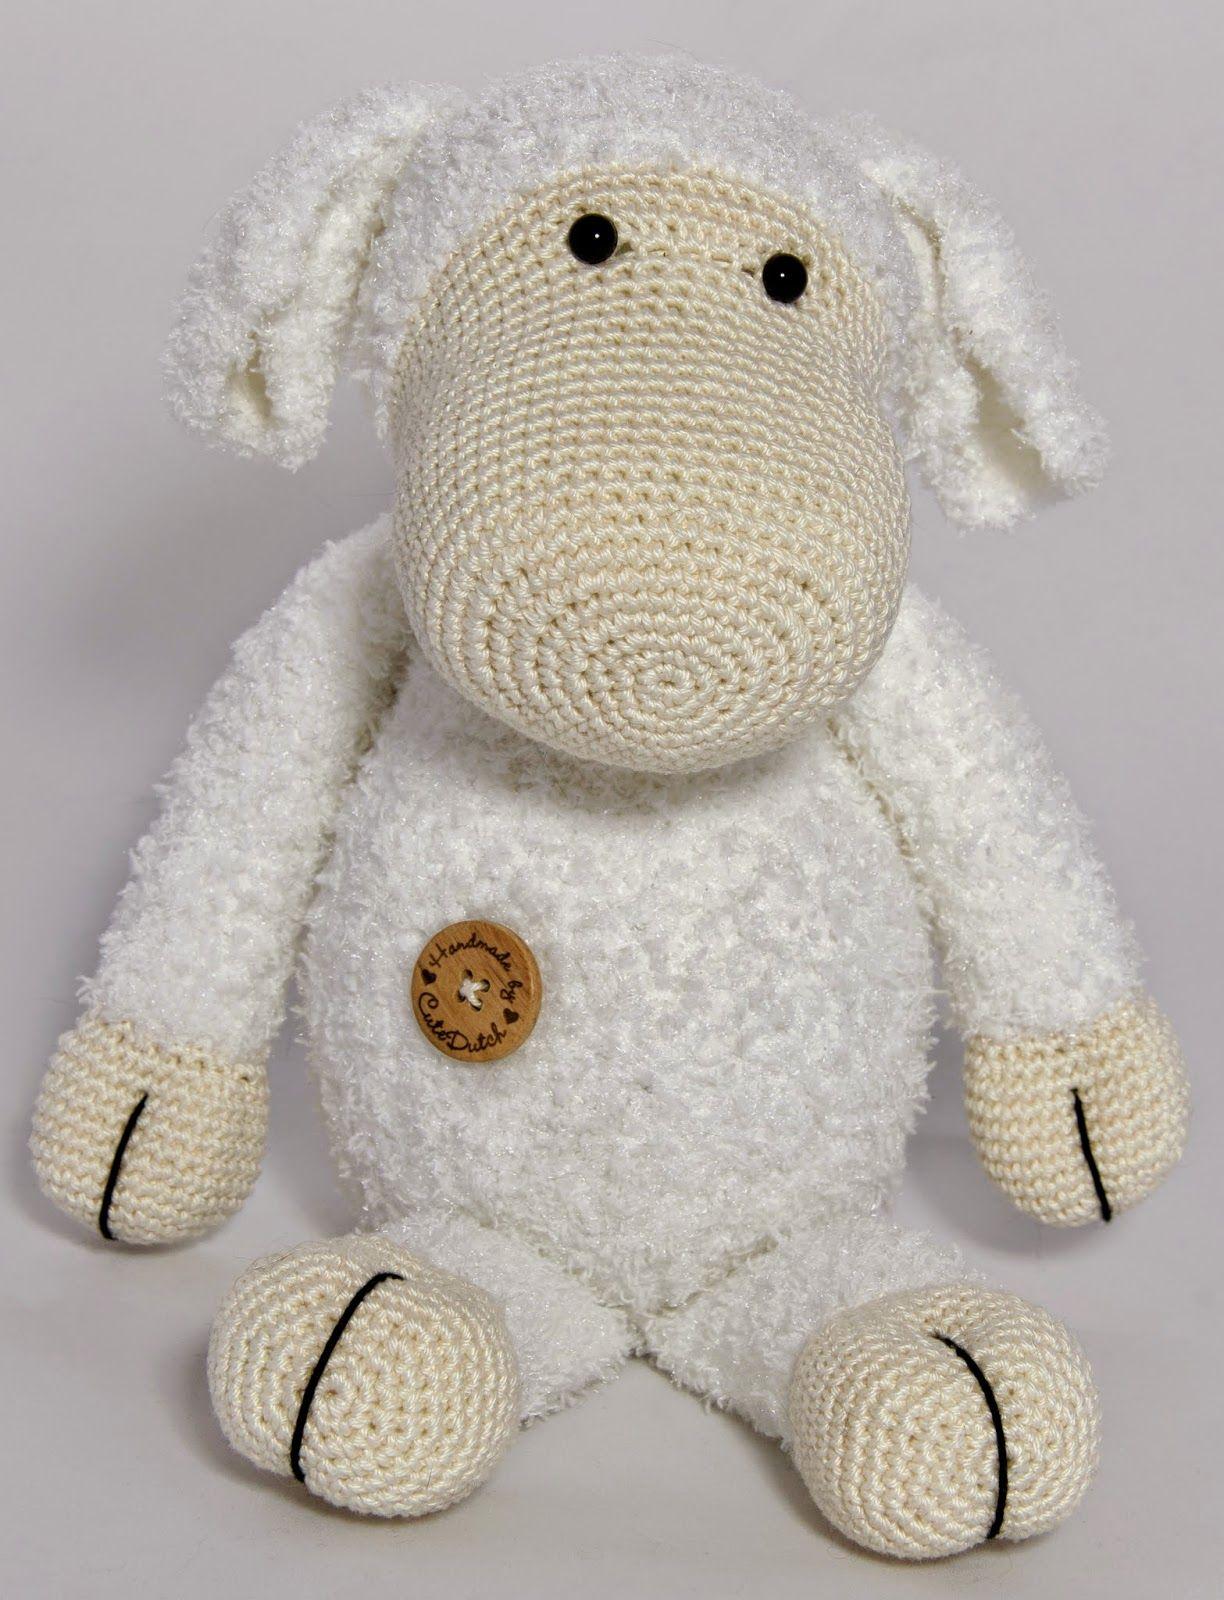 Pin By Misu On Figurine Crochet Pinterest Crochet Sheep Crochet